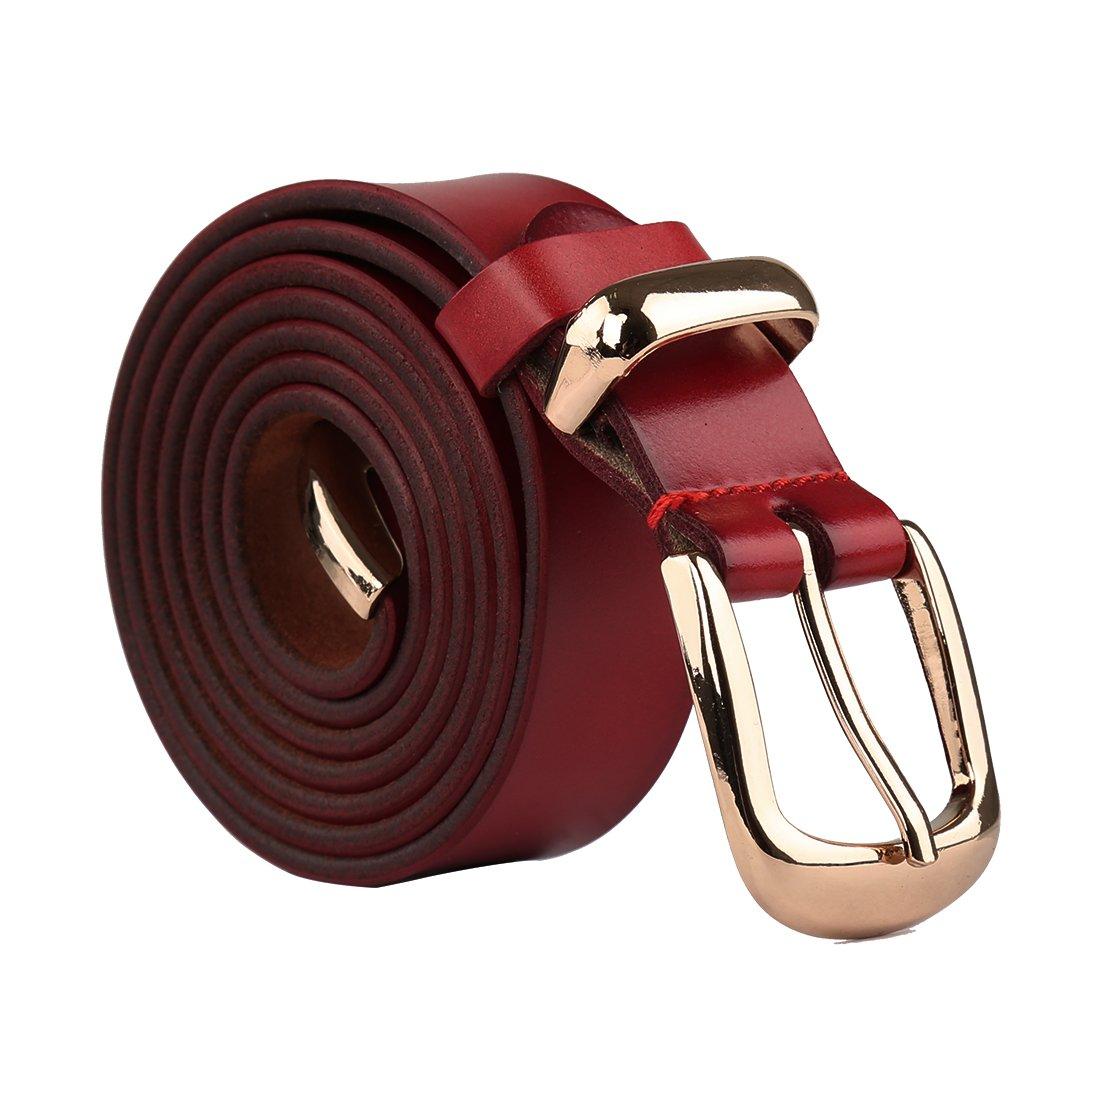 uxcell Women Skinny Belt Metal Side Imitation Leather Pin Buckle 1 1/8'' Burgundy